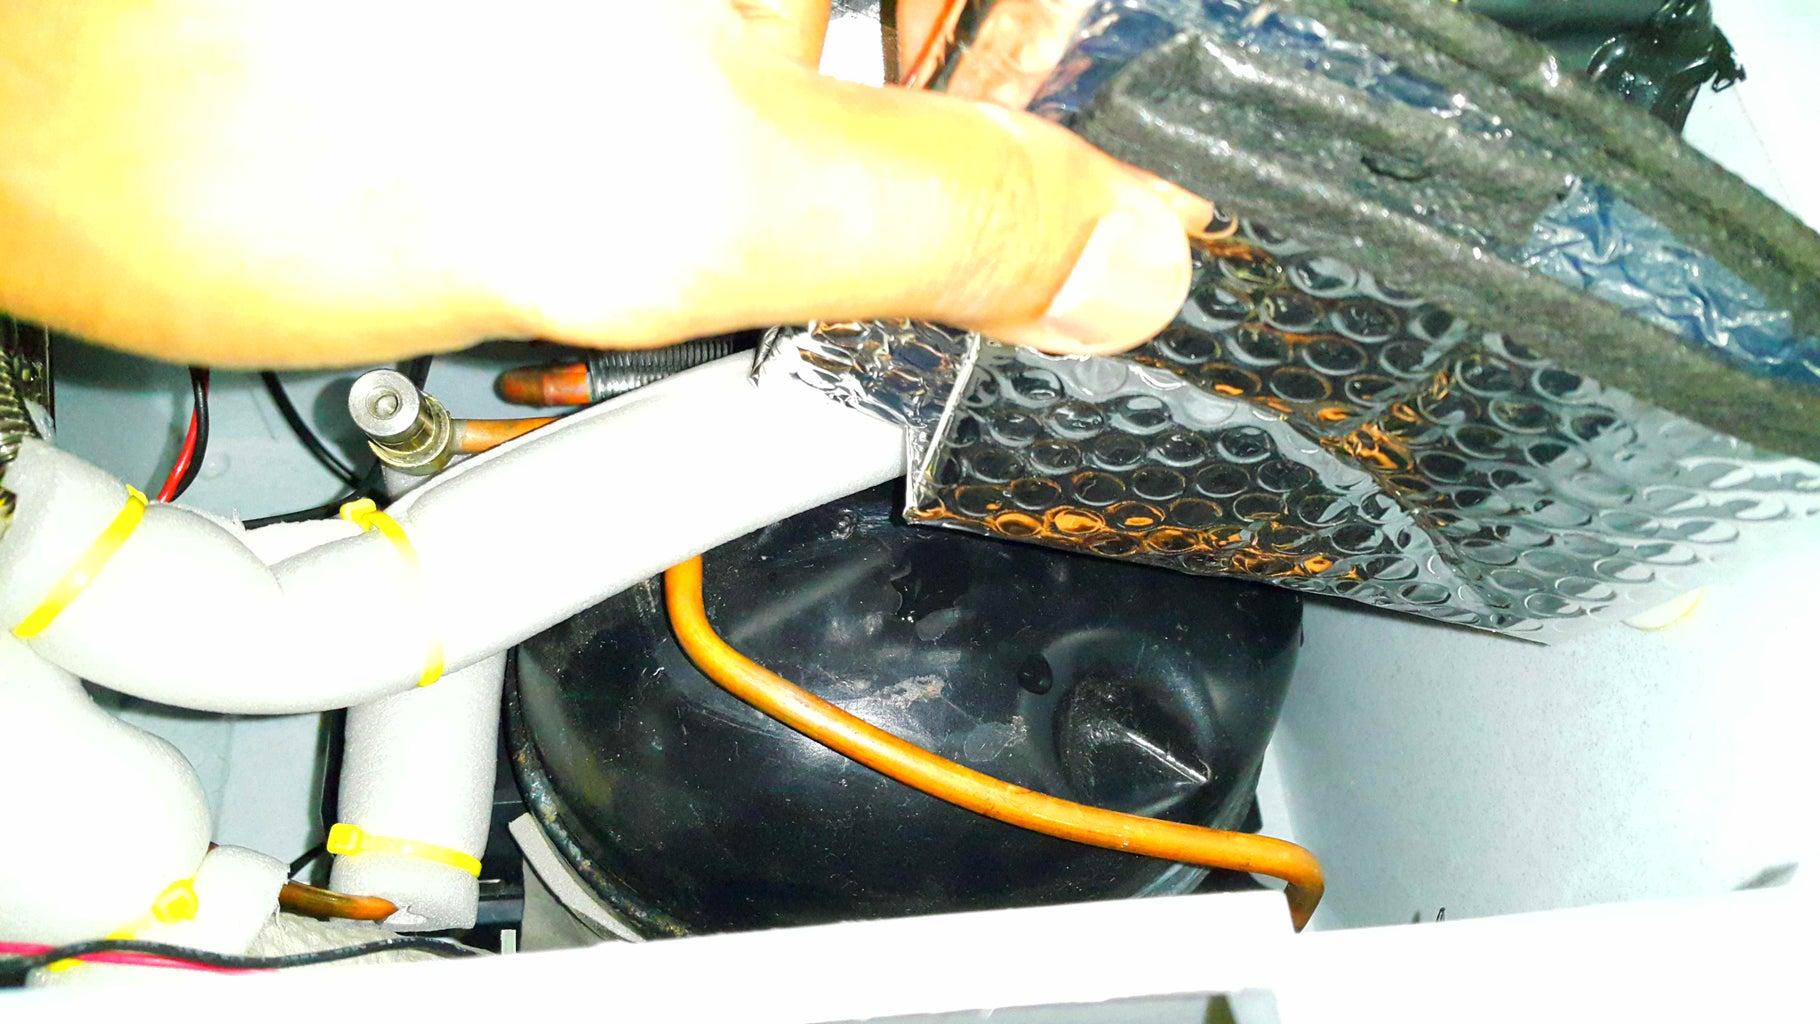 Adding Heat Shielding.